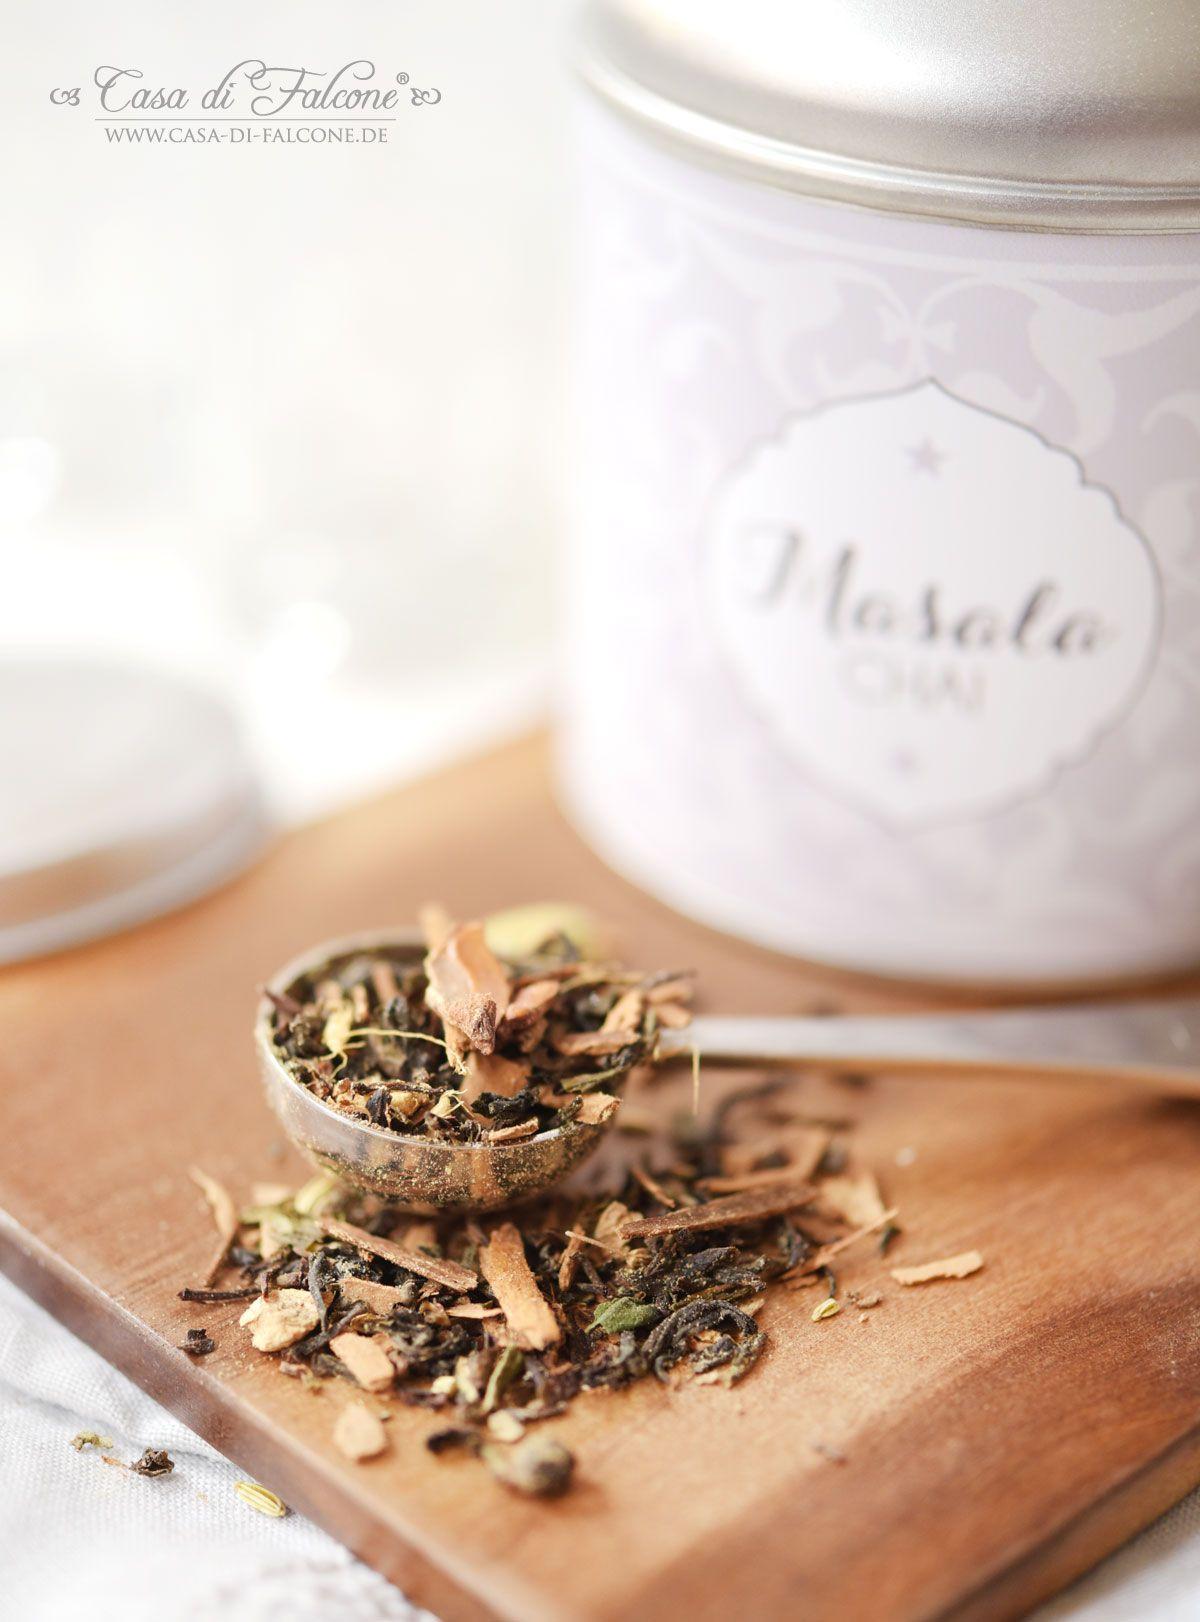 Chai Latte Teemischung Rezept Verpackungsidee Teemischungen Rezepte Gruss Aus Der Kuche